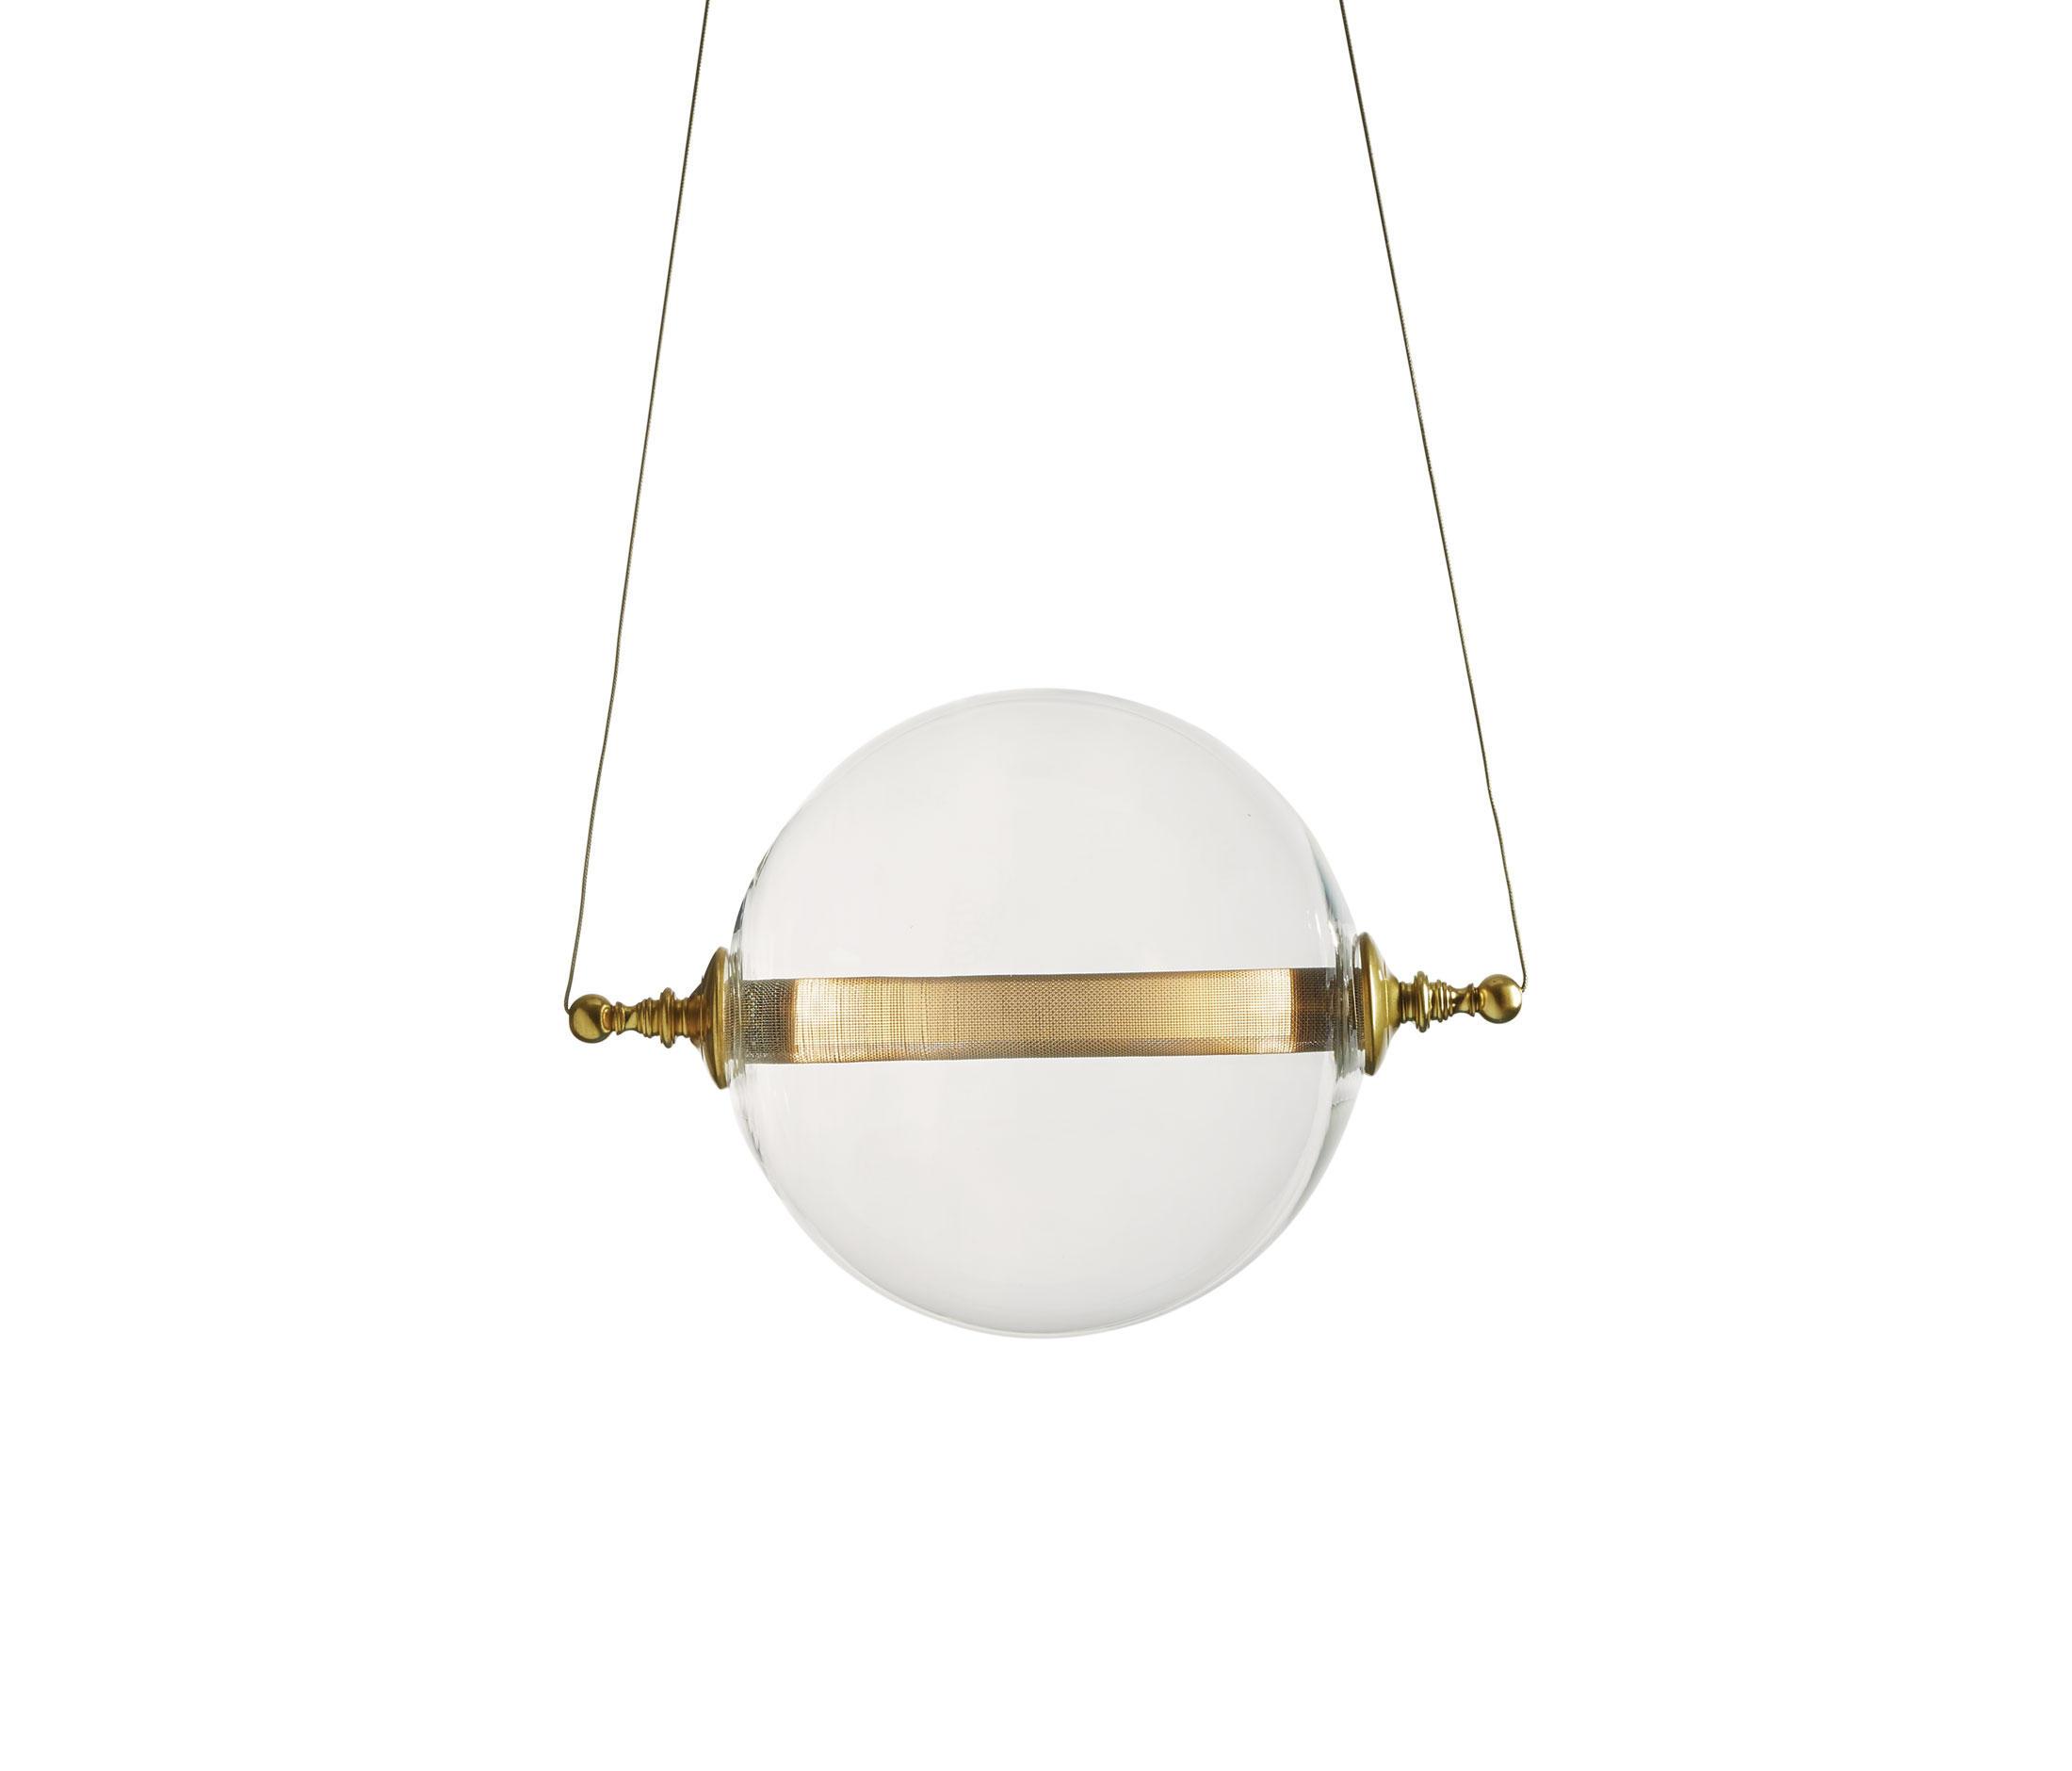 Otto Sphere Low Voltage Mini Pendant Suspended Lights